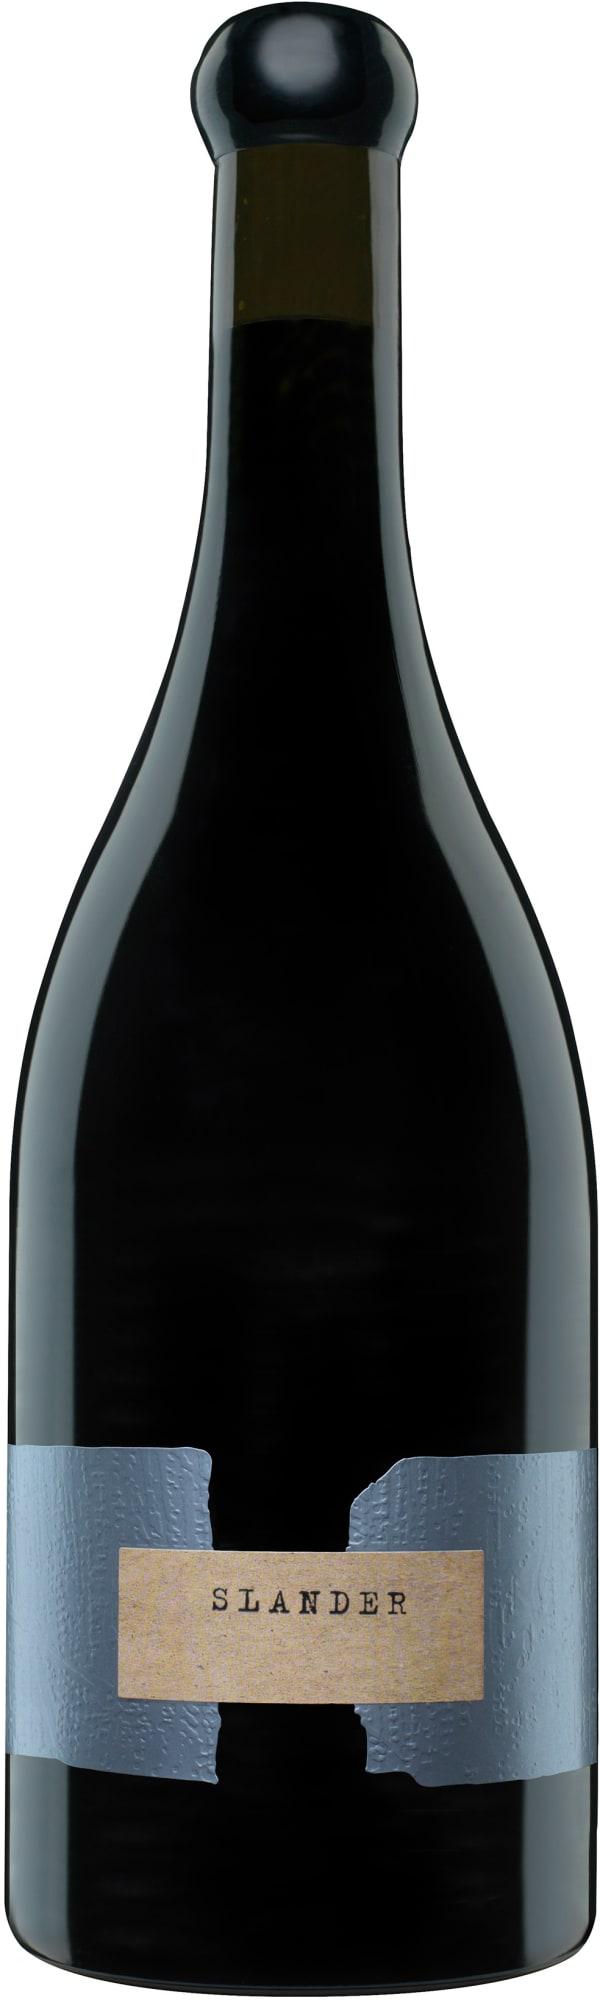 Orin Swift Slander Pinot Noir 2016